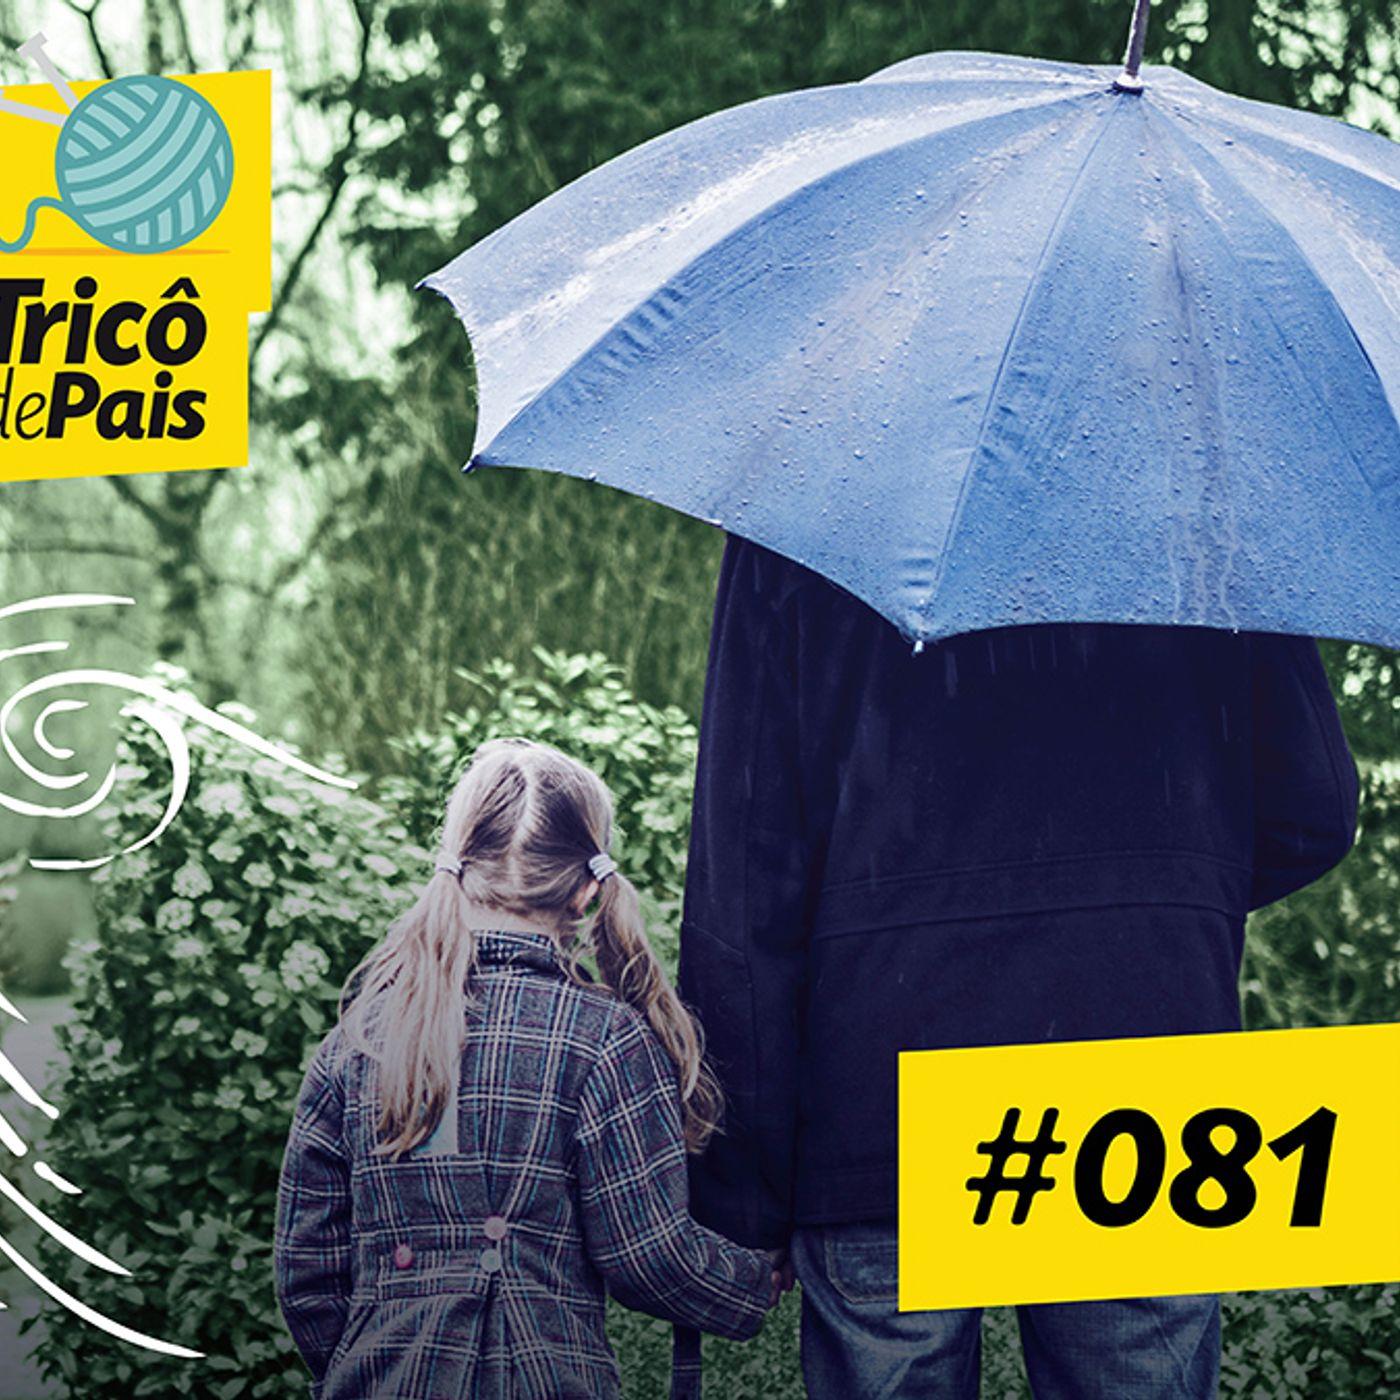 #081 - Paternidade, Luto e Vida com Filhos feat. Paulo Pernambuco